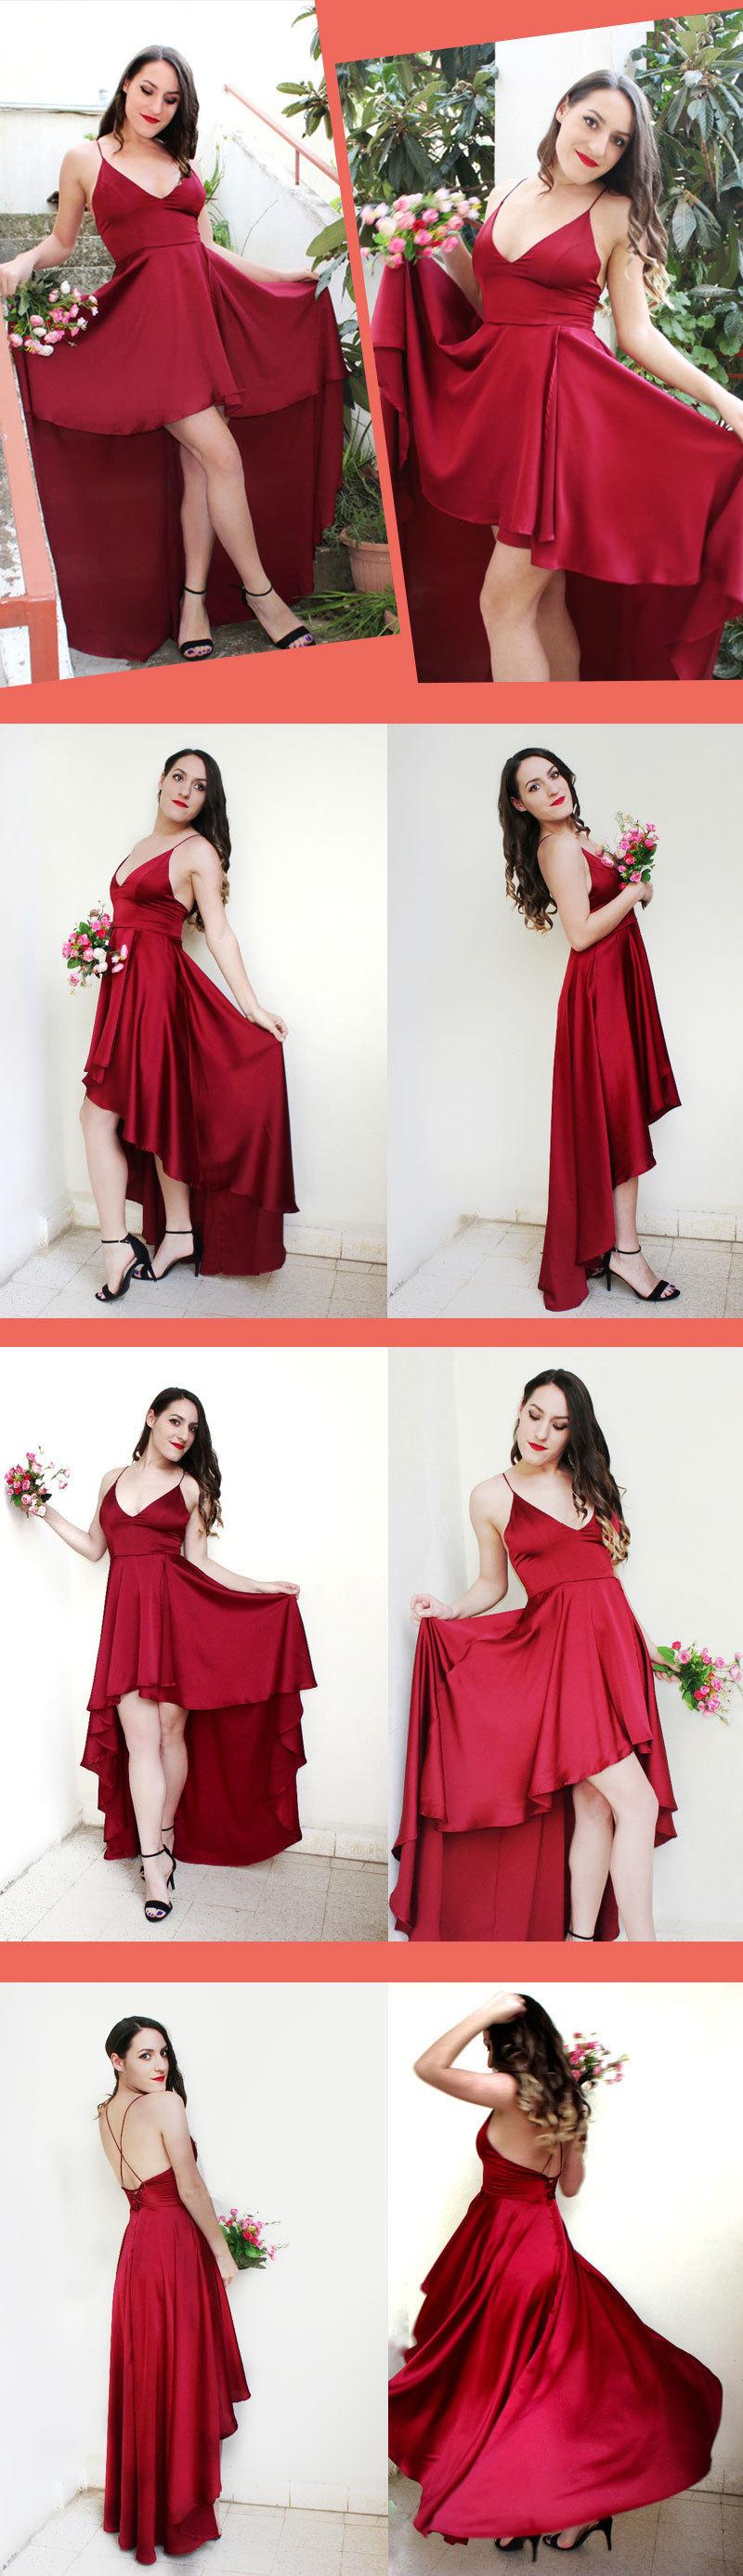 dressmmc170915703